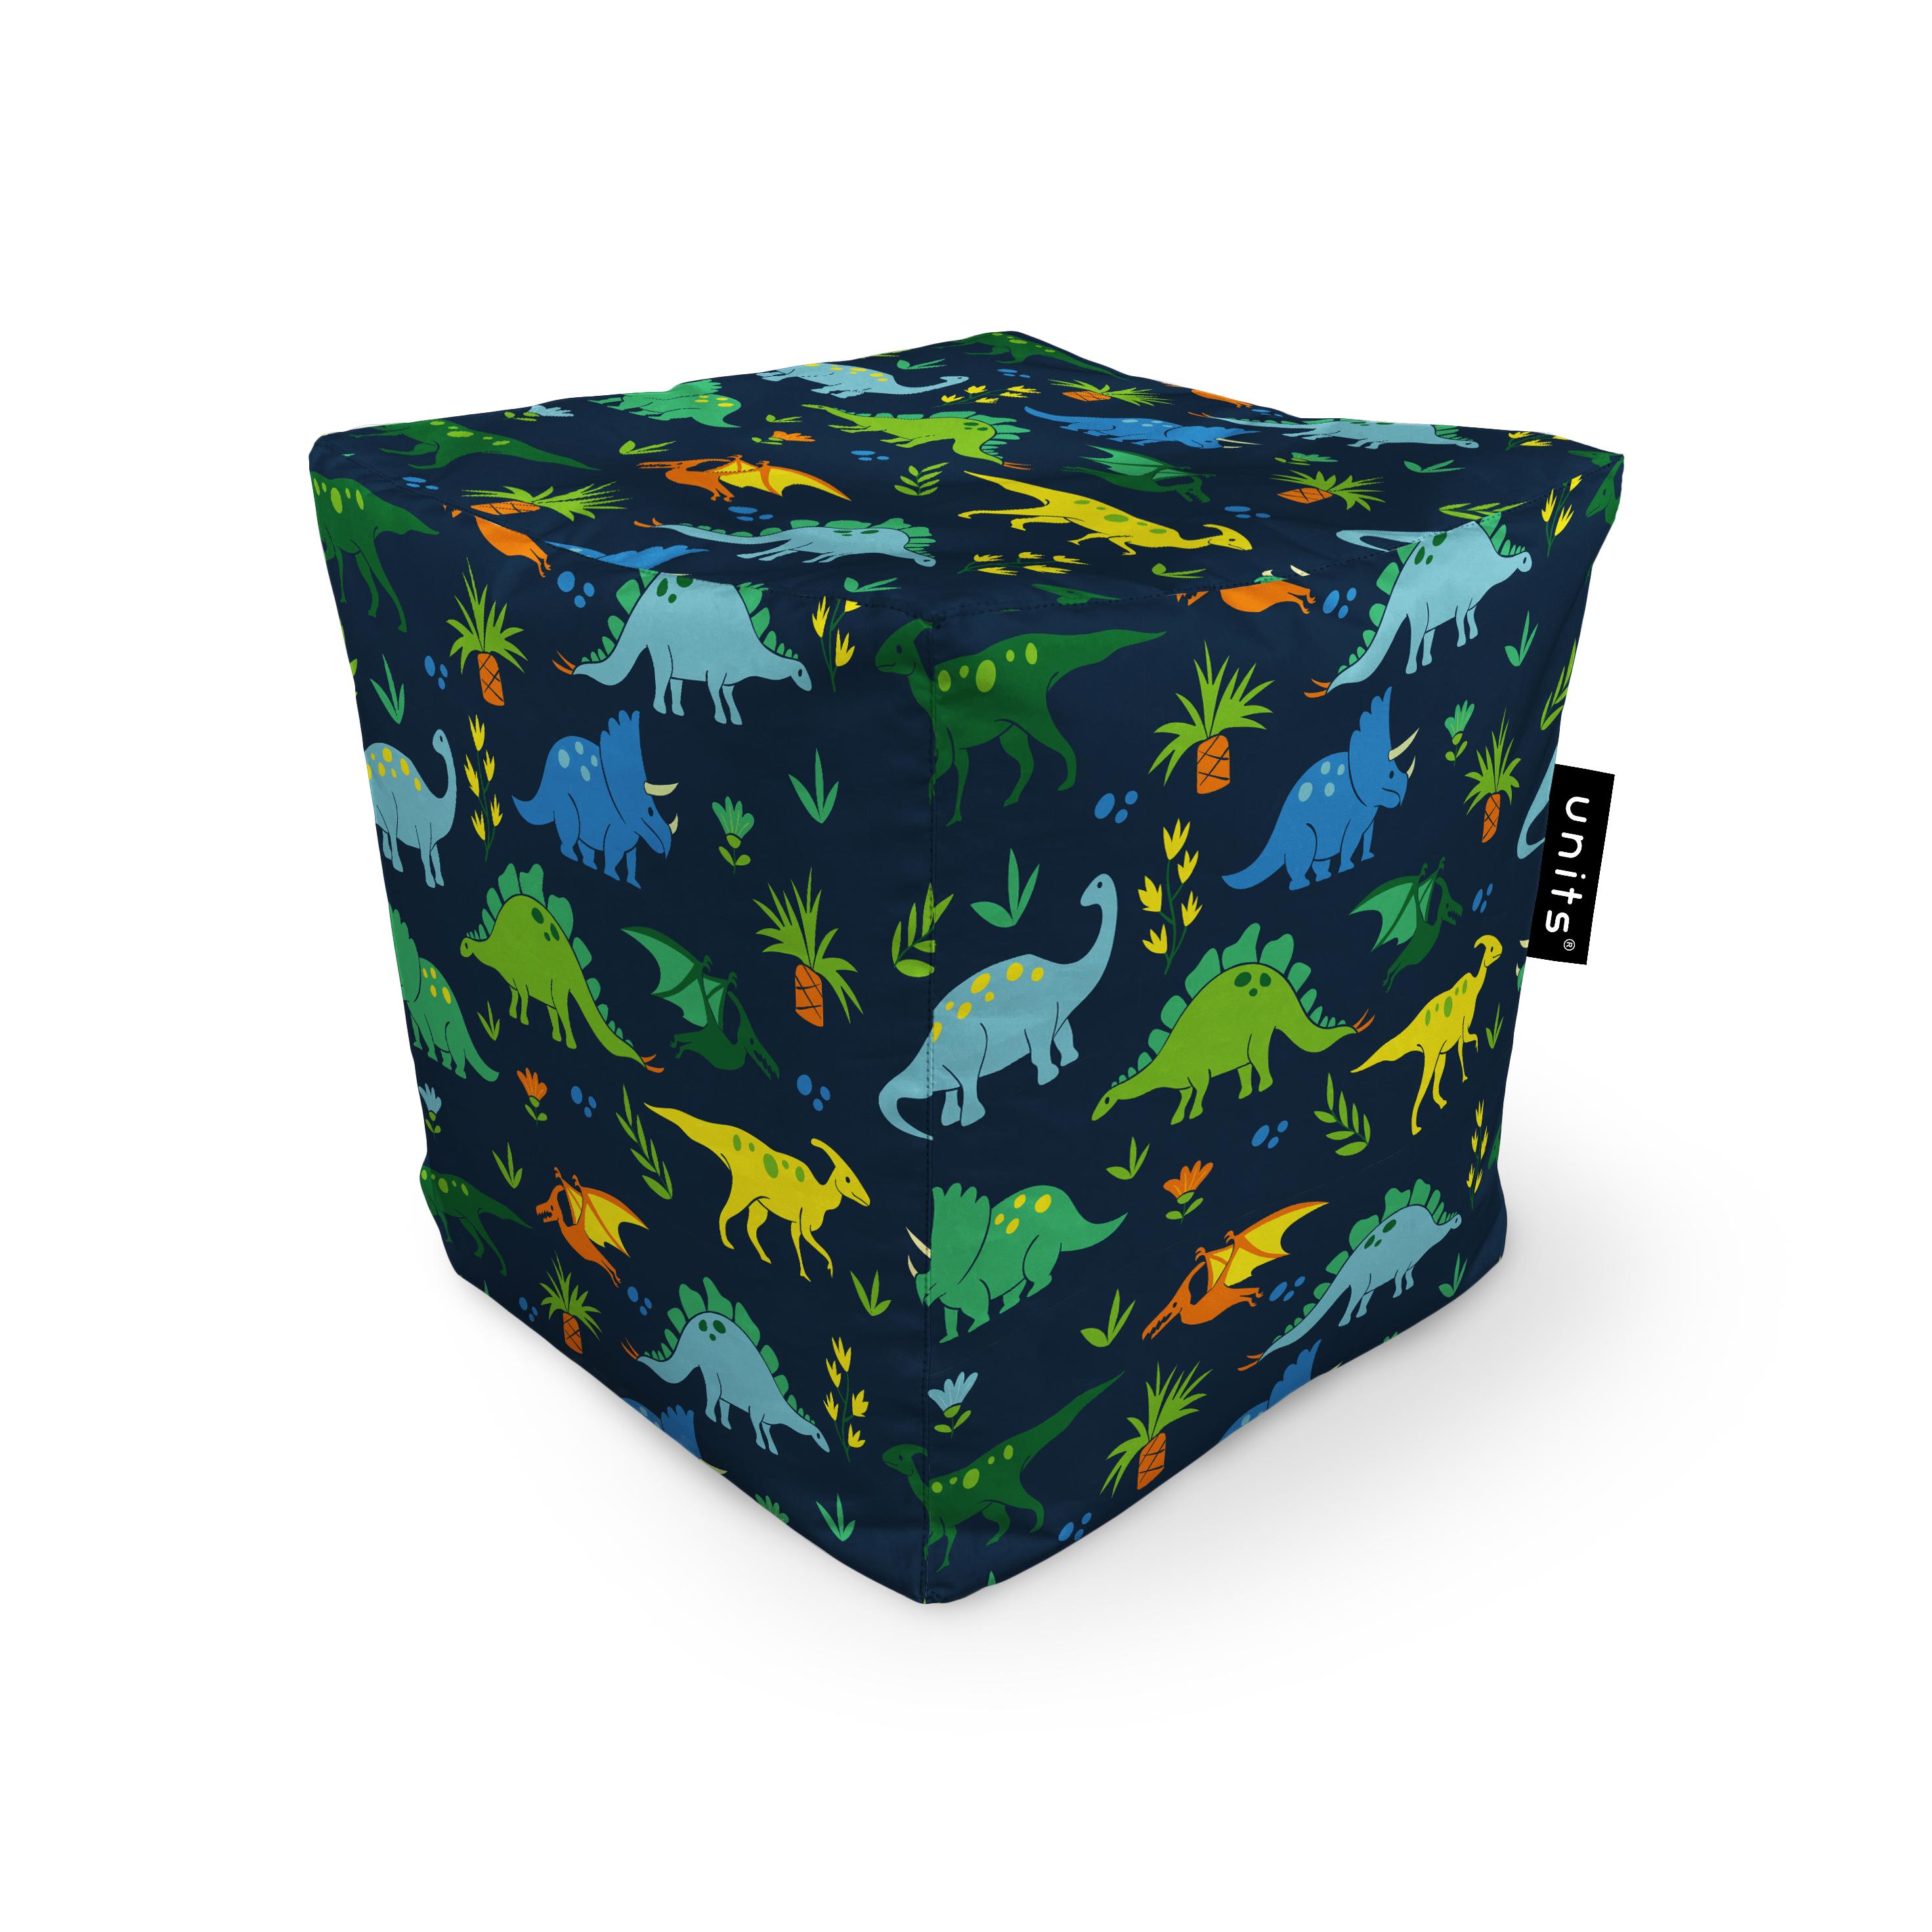 Fotoliu units puf (bean bags) tip cub, impermeabil, dinozauri imagine